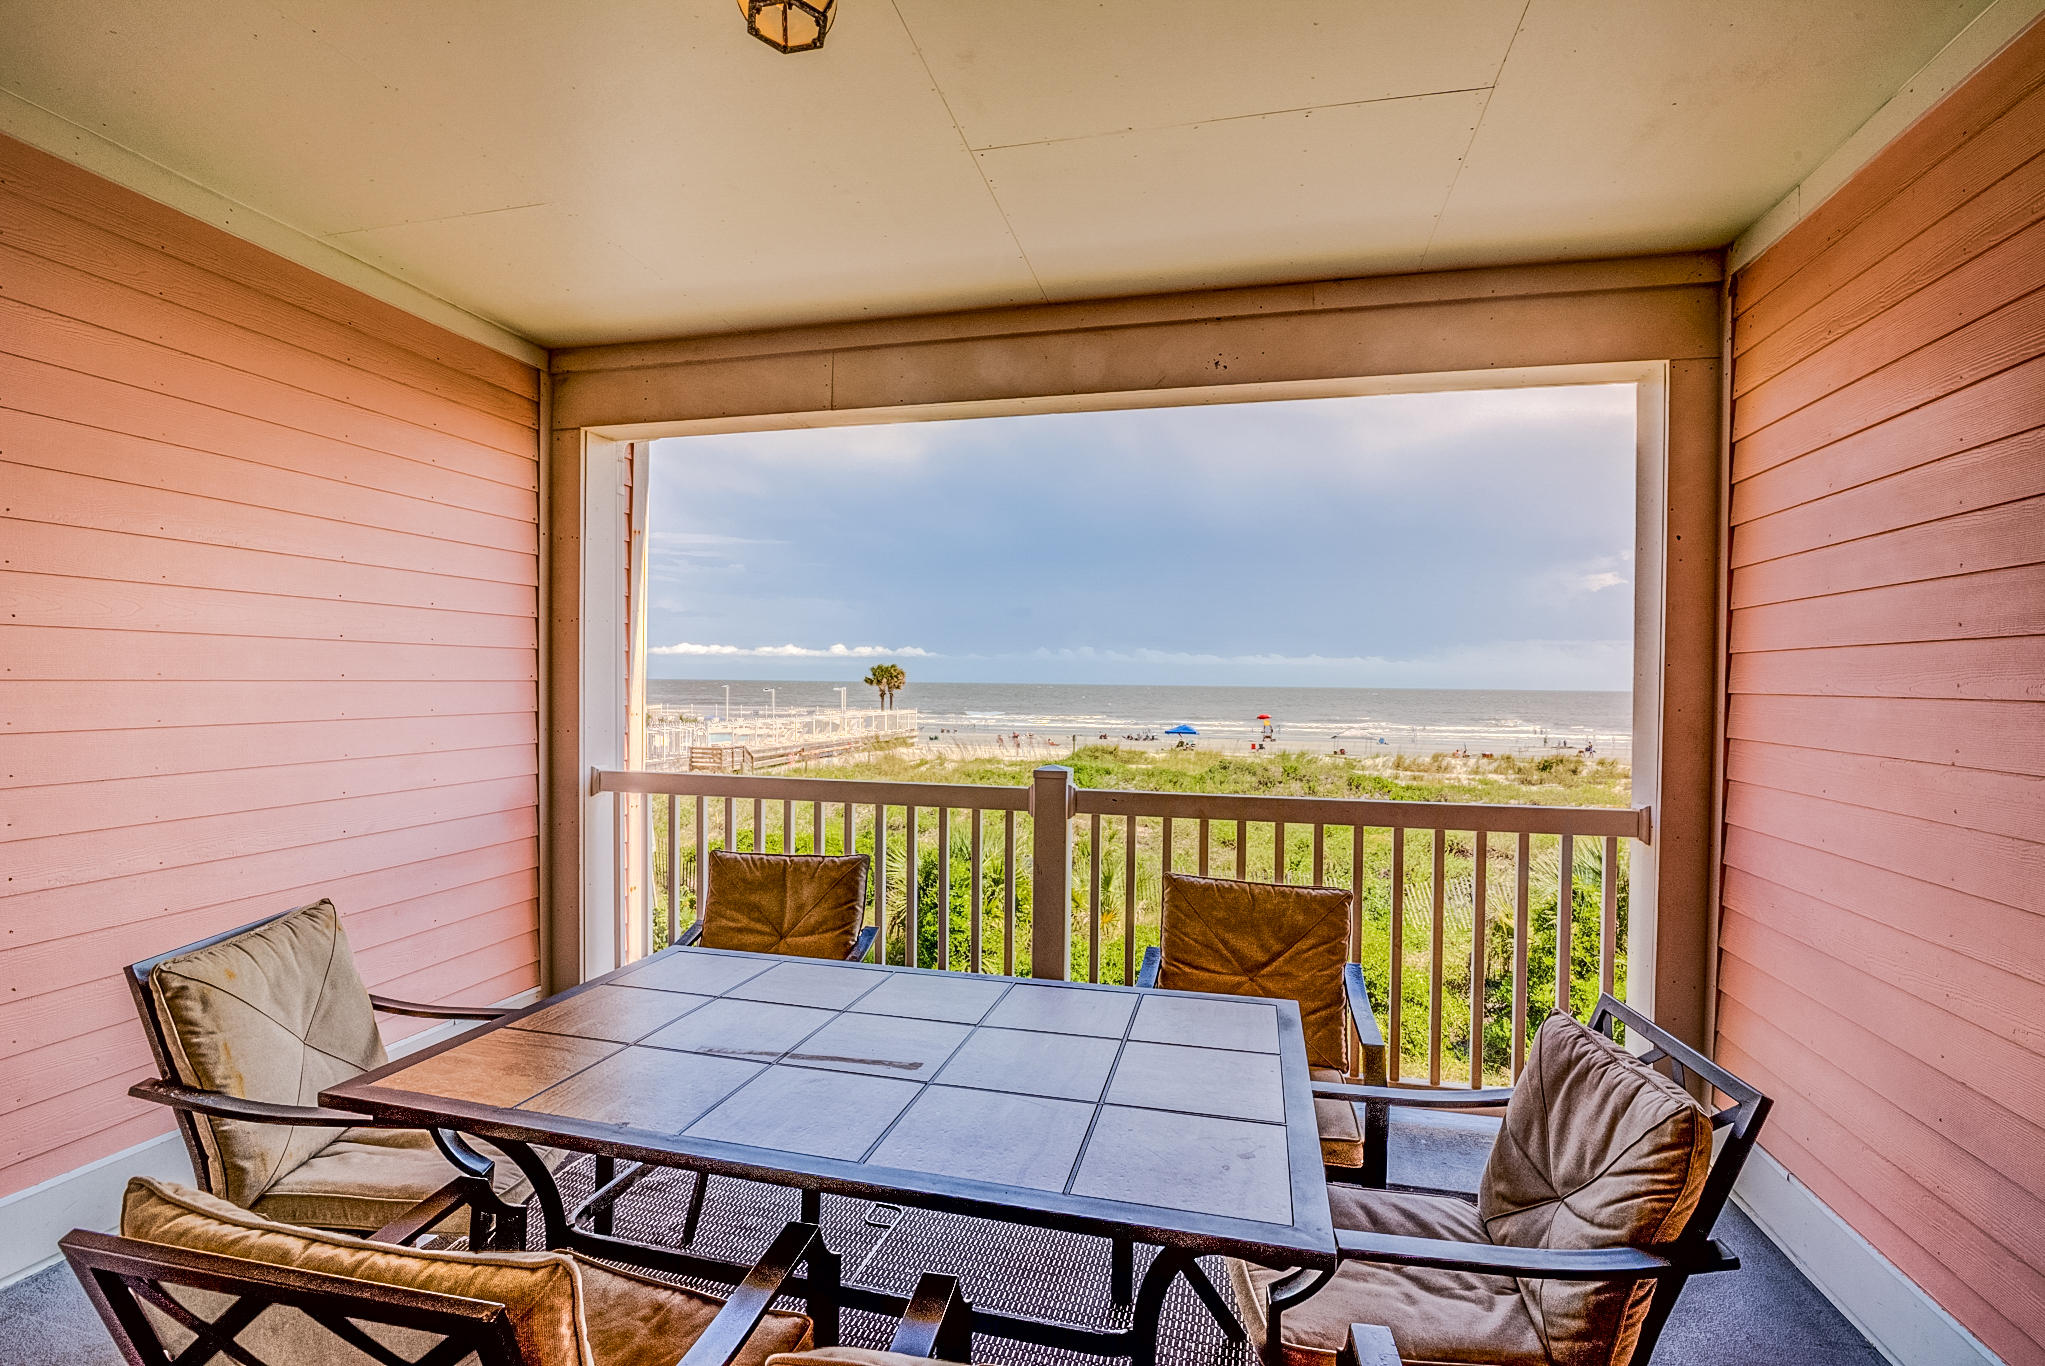 Ocean Pointe Villas Homes For Sale - 214 Arctic, Folly Beach, SC - 3